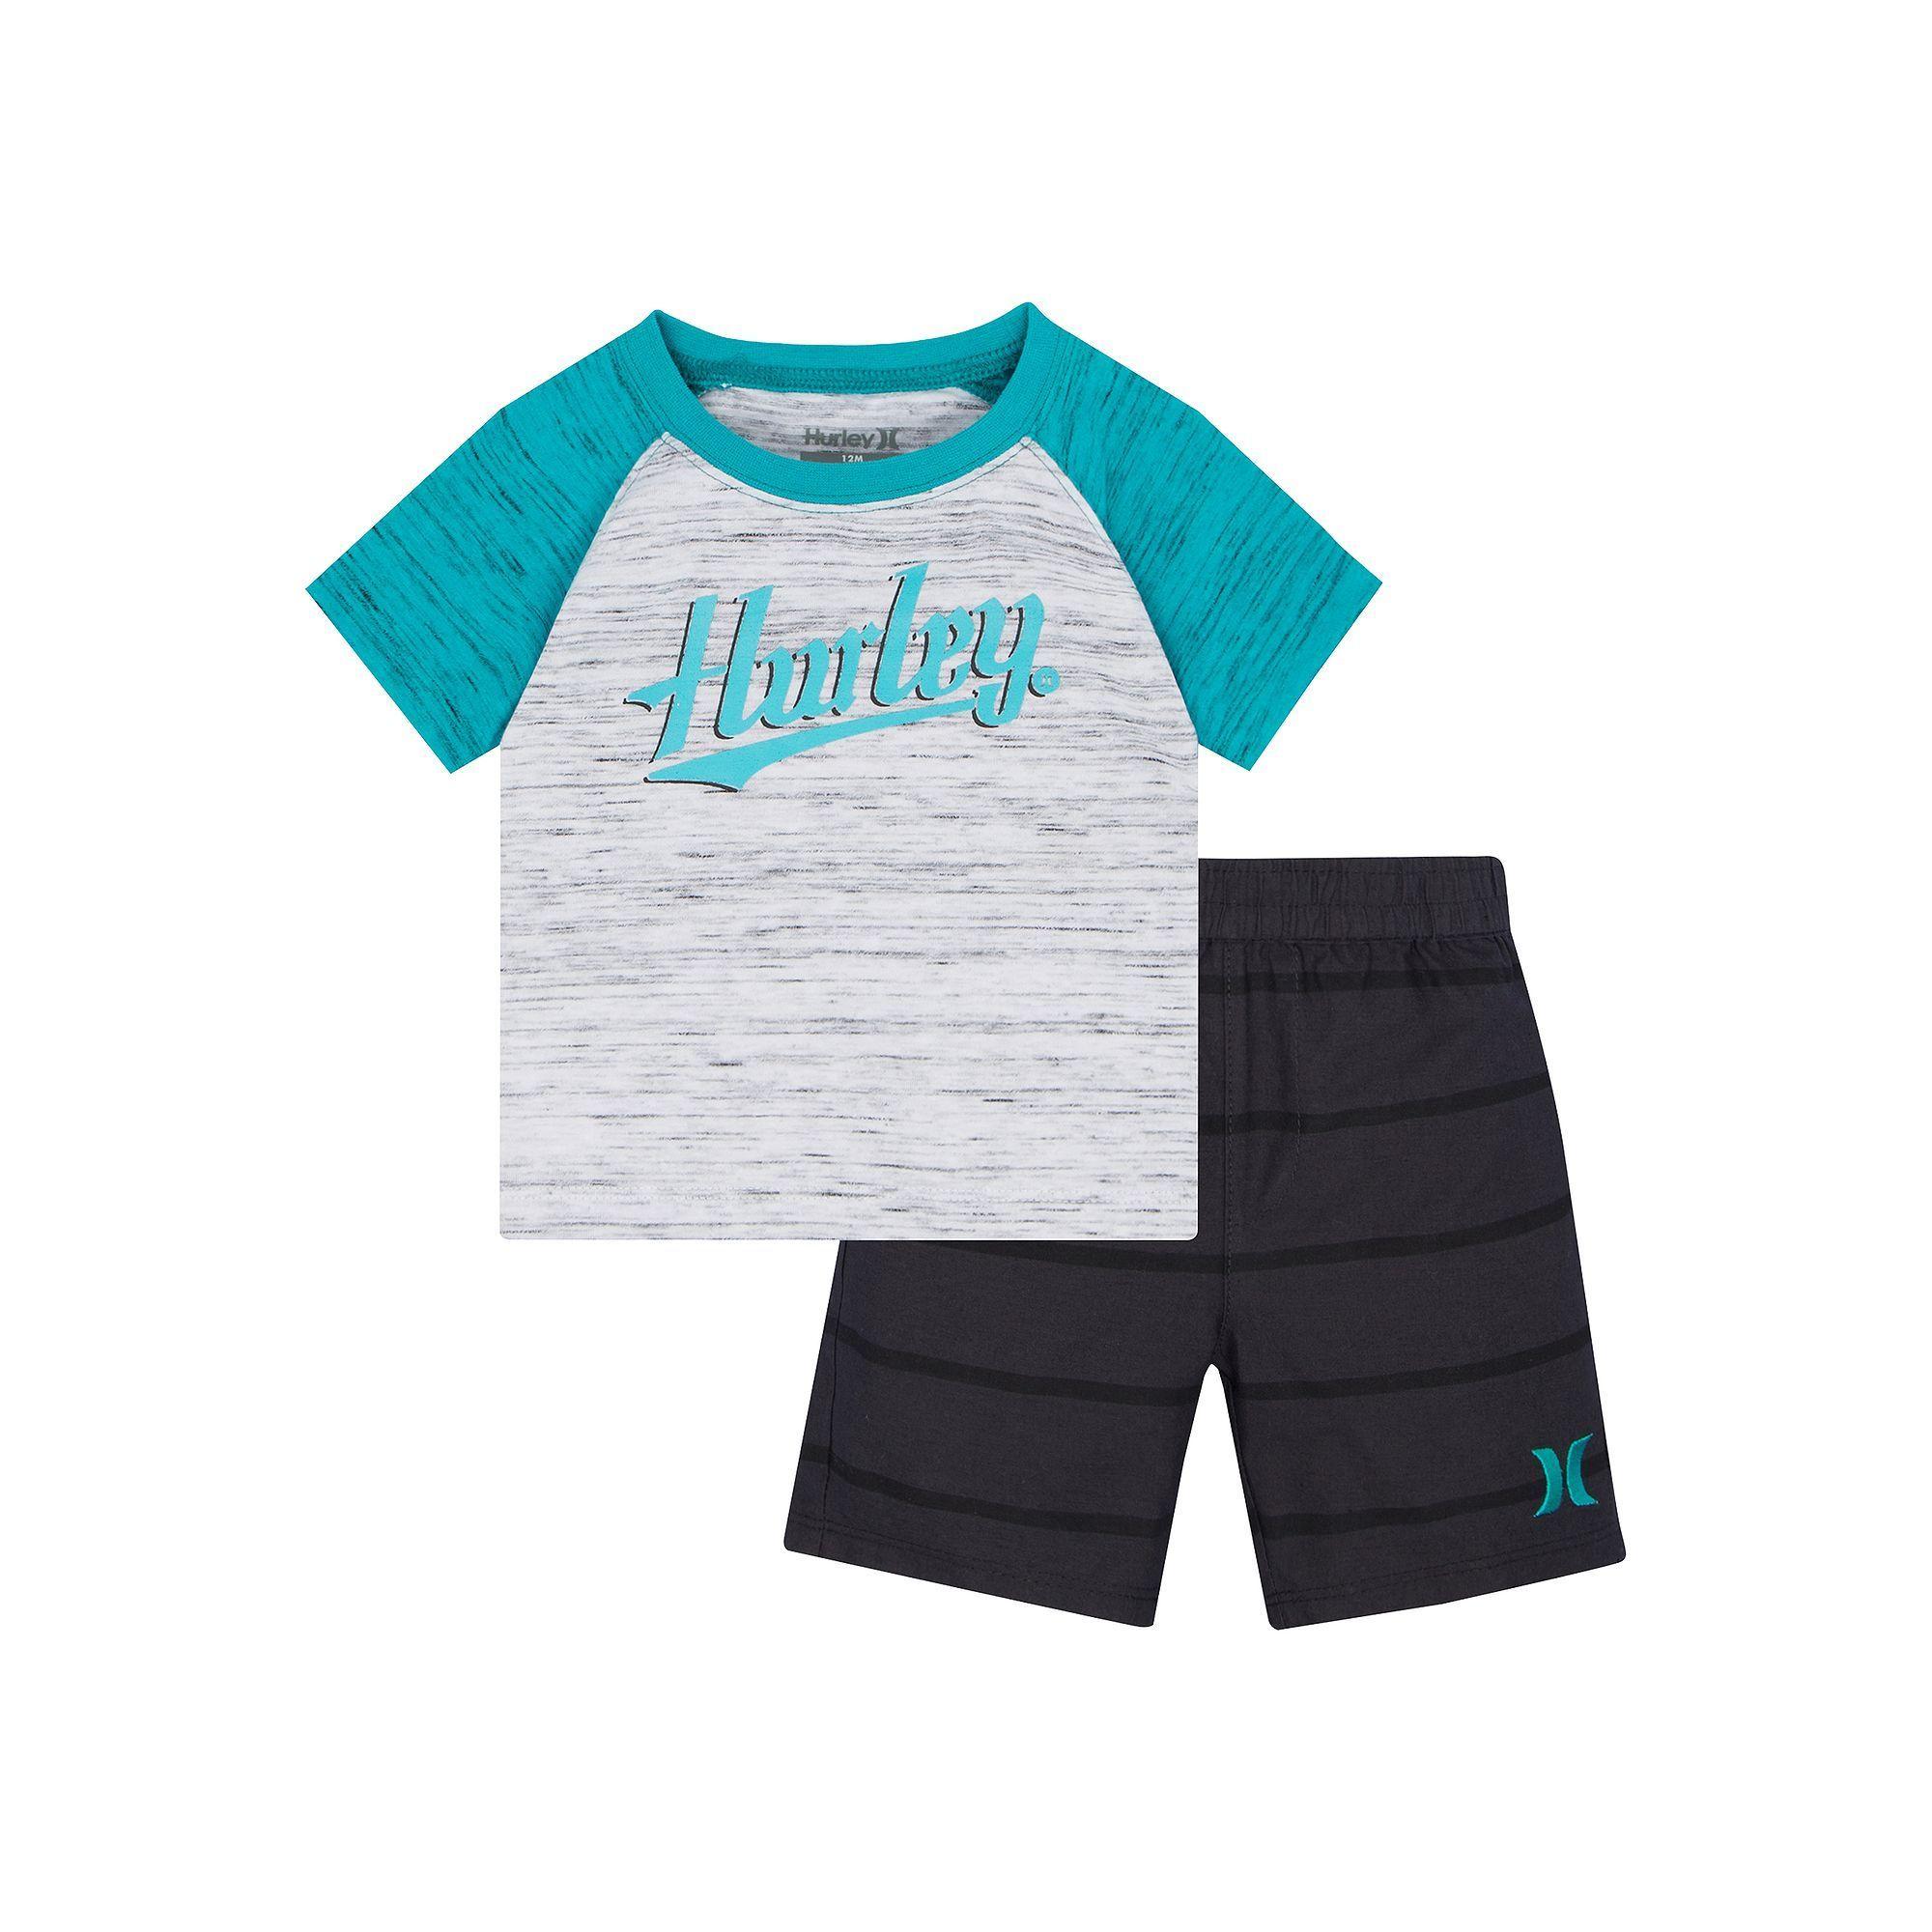 Baby Boy Hurley Raglan Logo Graphic Tee & Striped Shorts Set Size